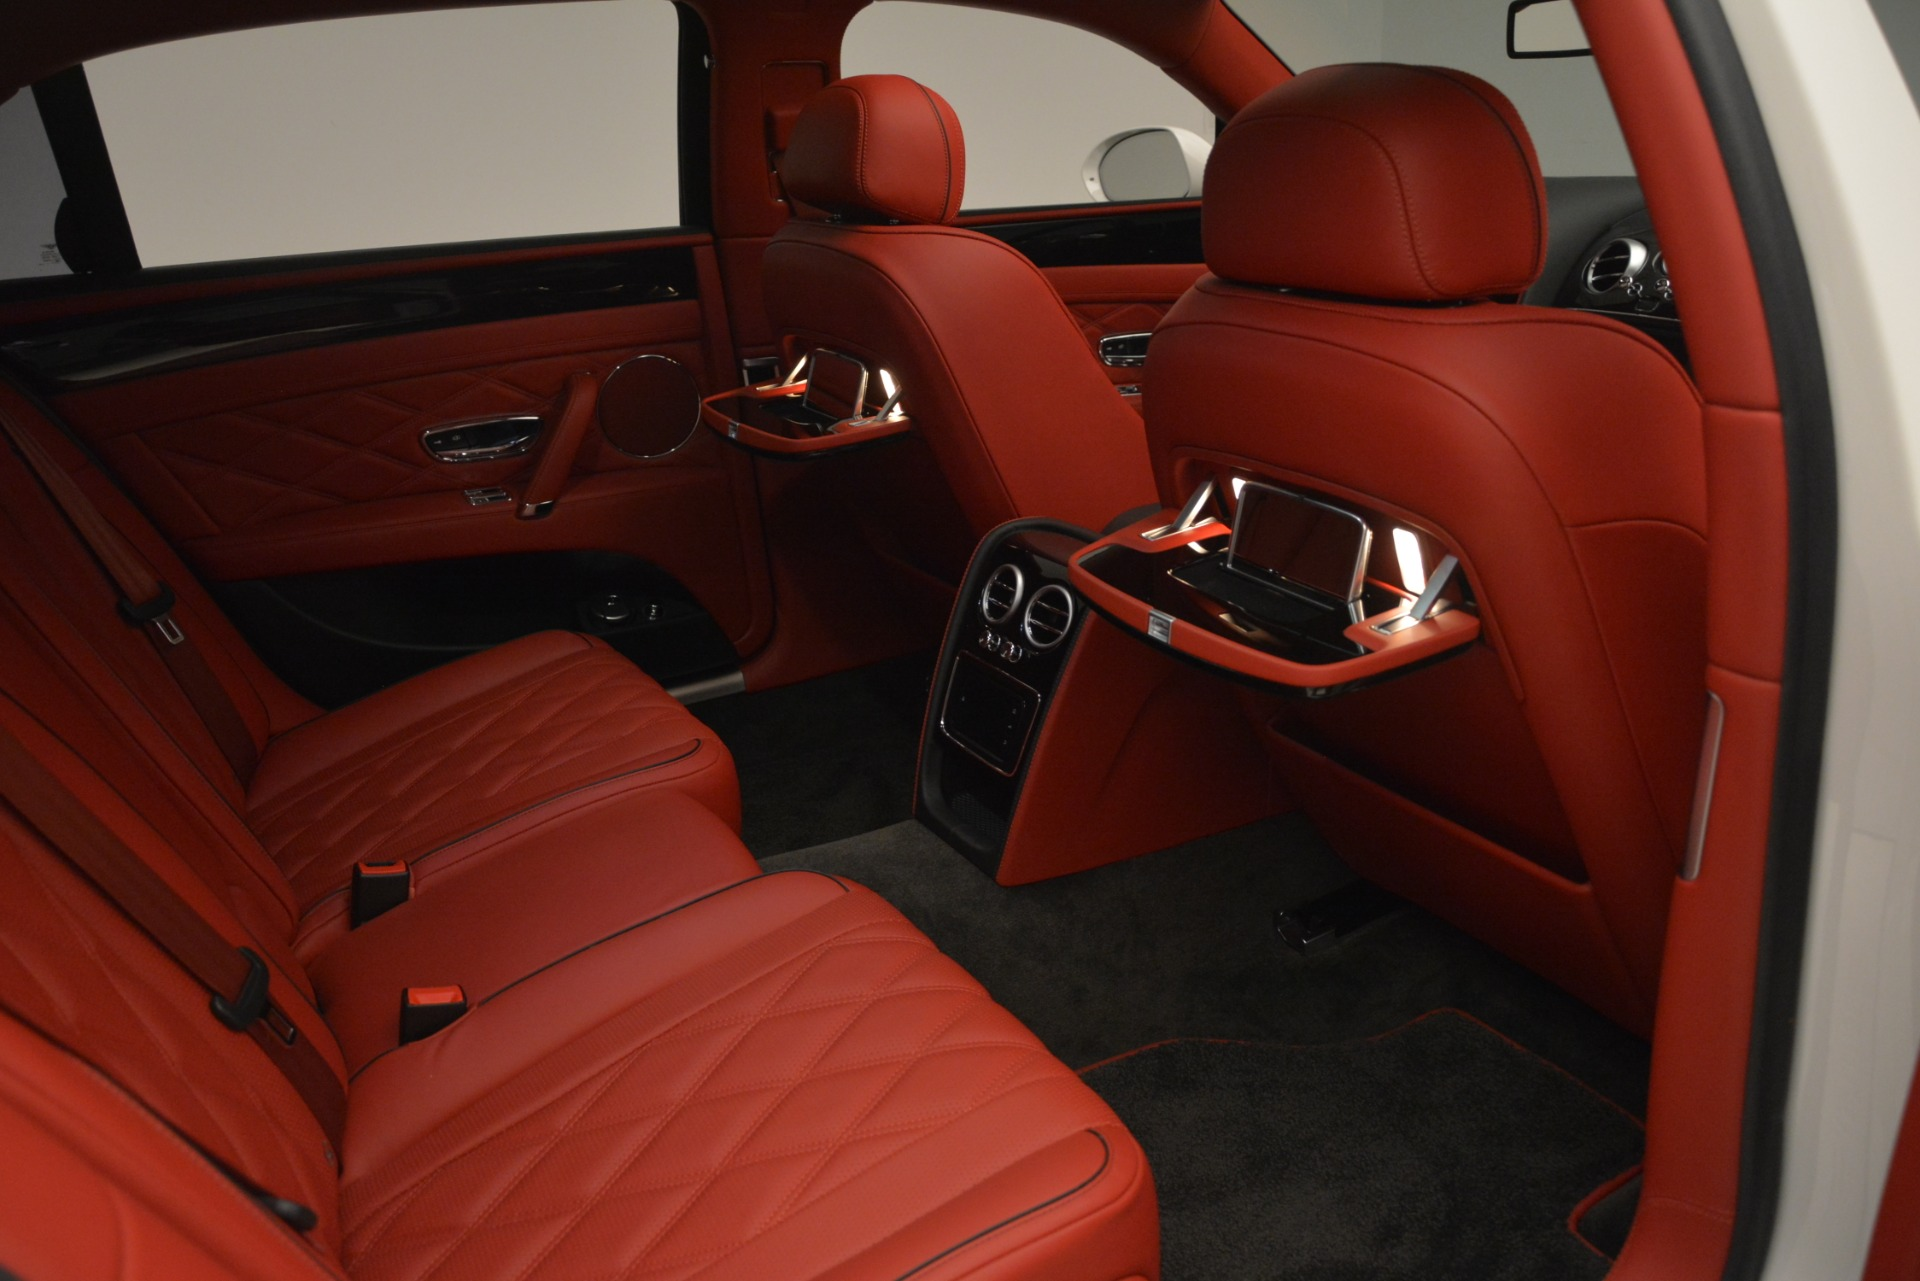 Used 2016 Bentley Flying Spur V8 For Sale In Westport, CT 3265_p26